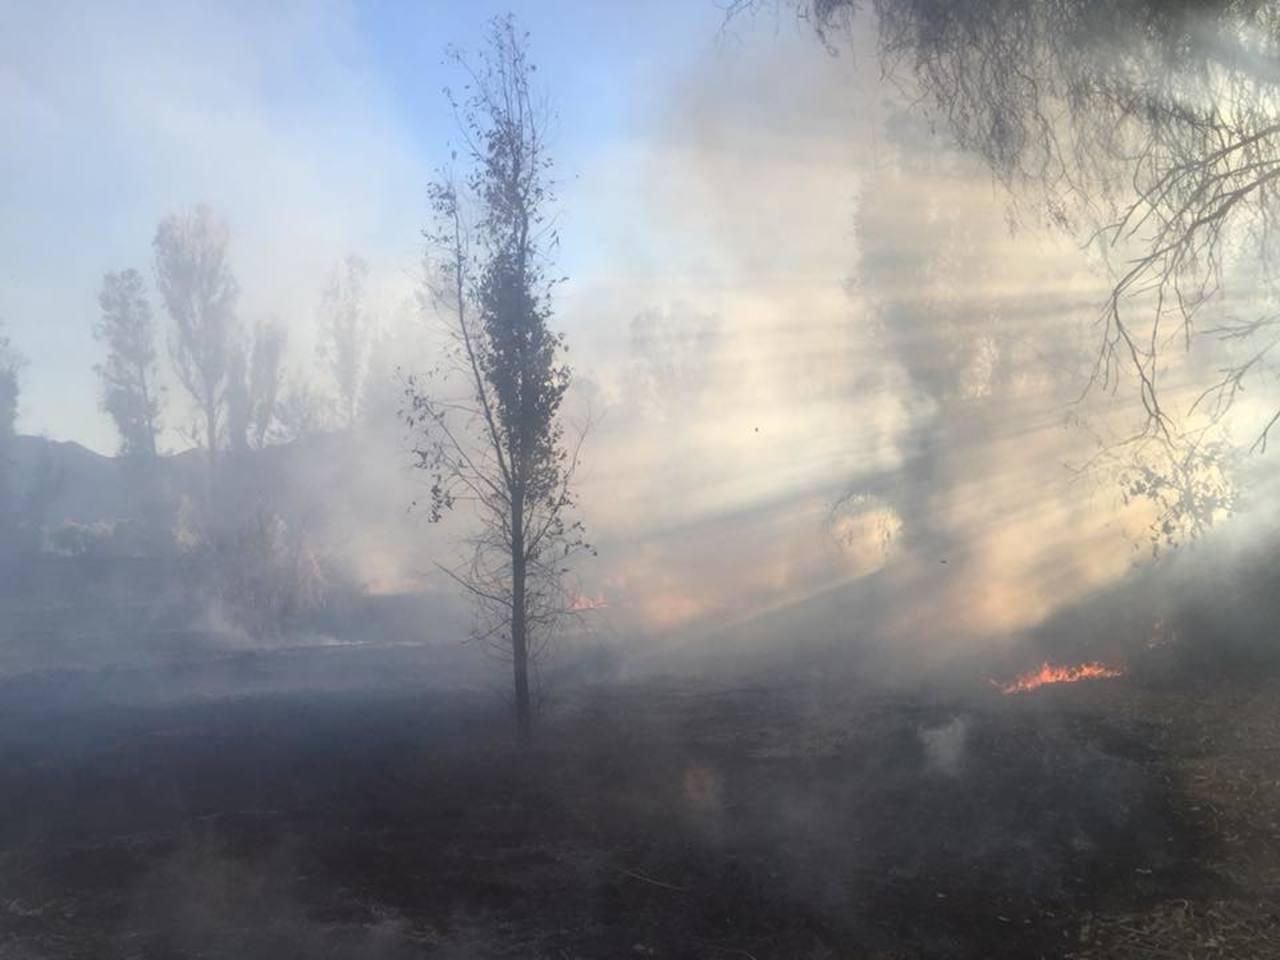 Durango, segundo más afectado por incendios forestales